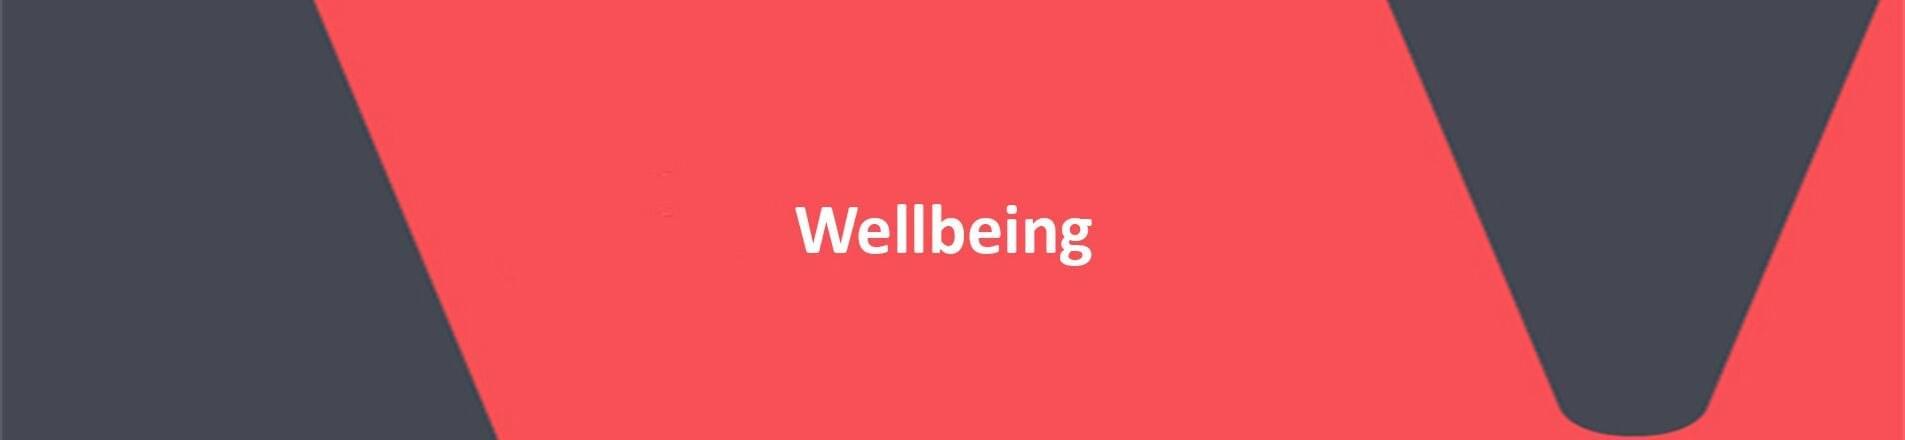 wellbeing Engie